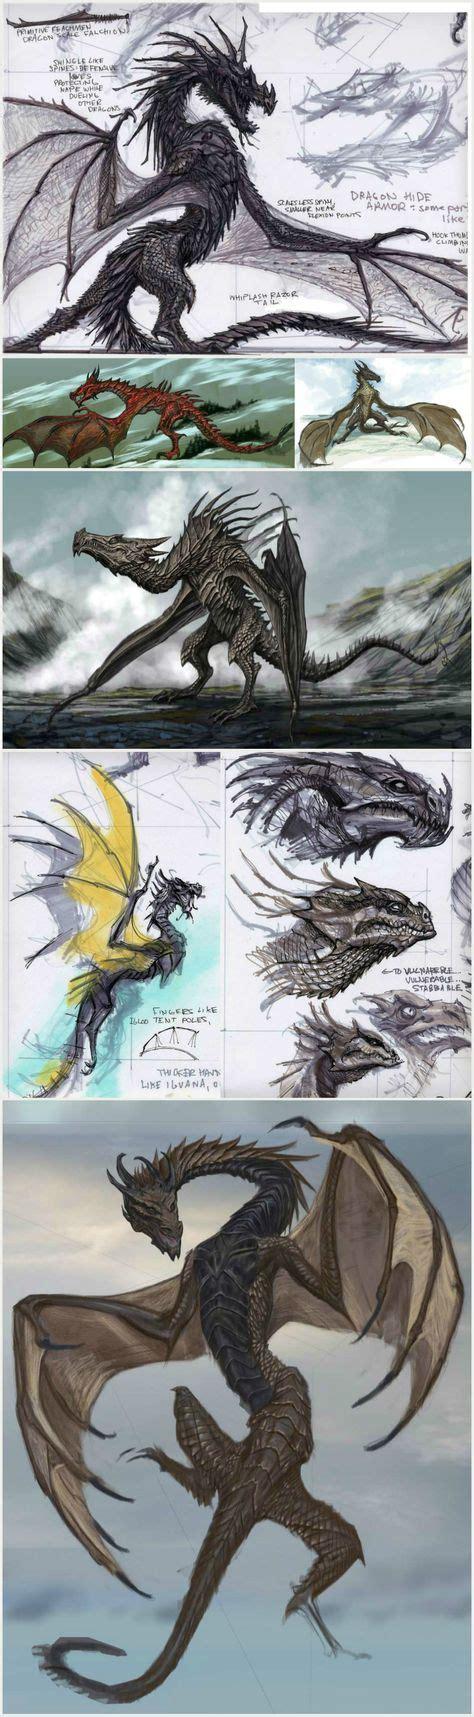 The Elder Scrolls V Skyrim Dragon Concept Art By The